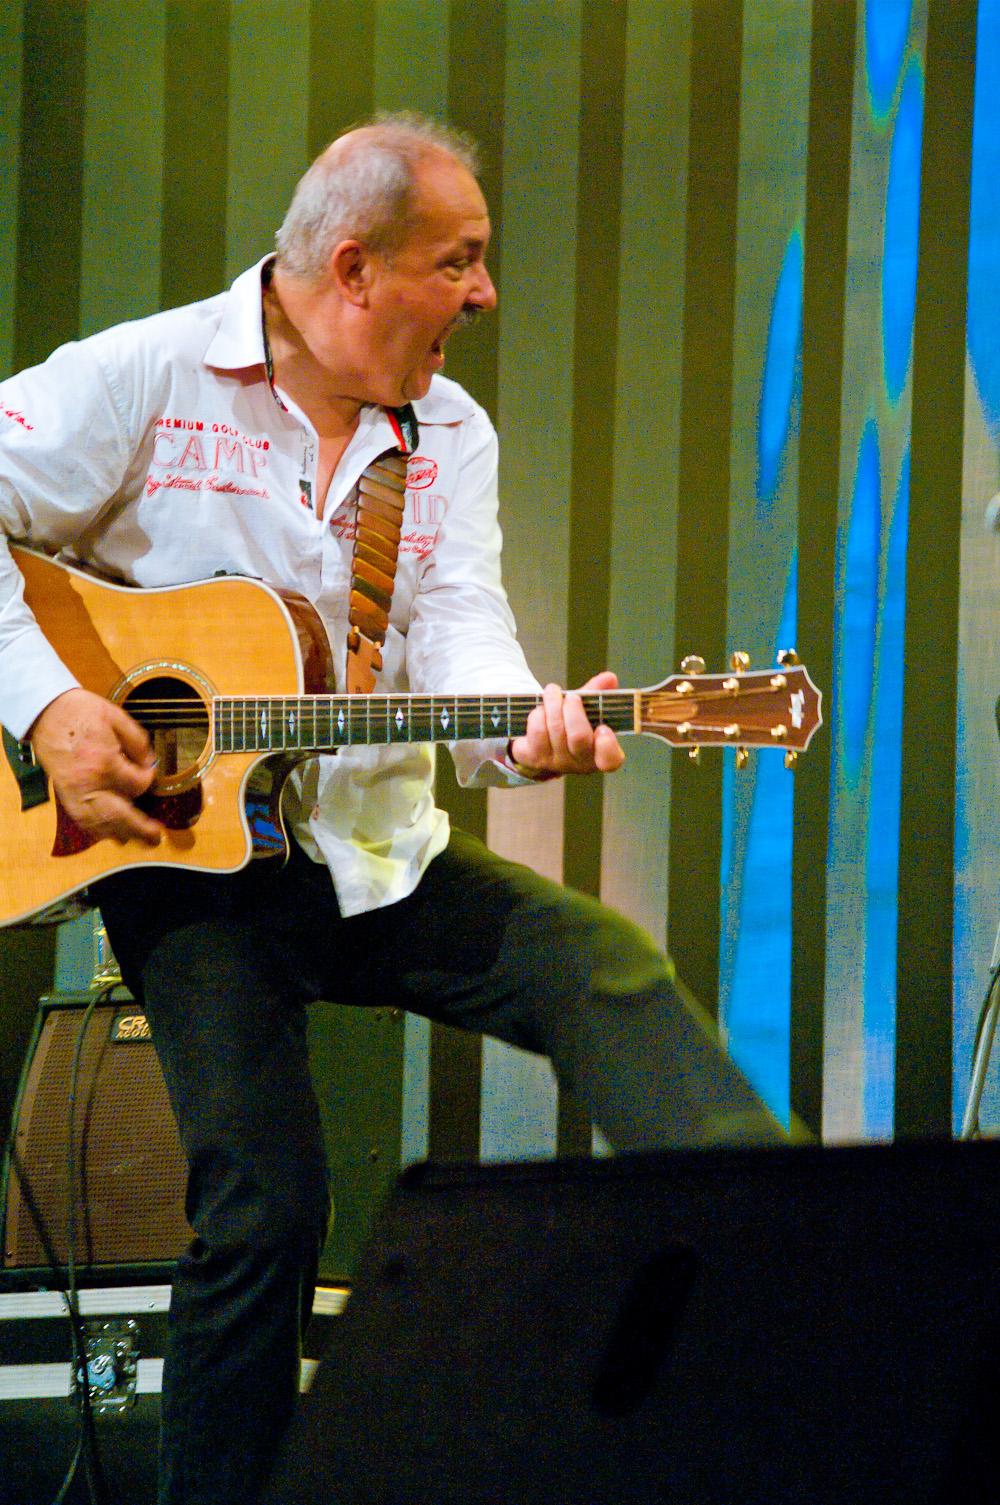 Medard Konopík, koncert Honzy Vyčítala a skupiny Greenhorns, Praha, Divadlo ABC 21.10.2012 (Foto: Jiří Konc / CountryWorld.cz)